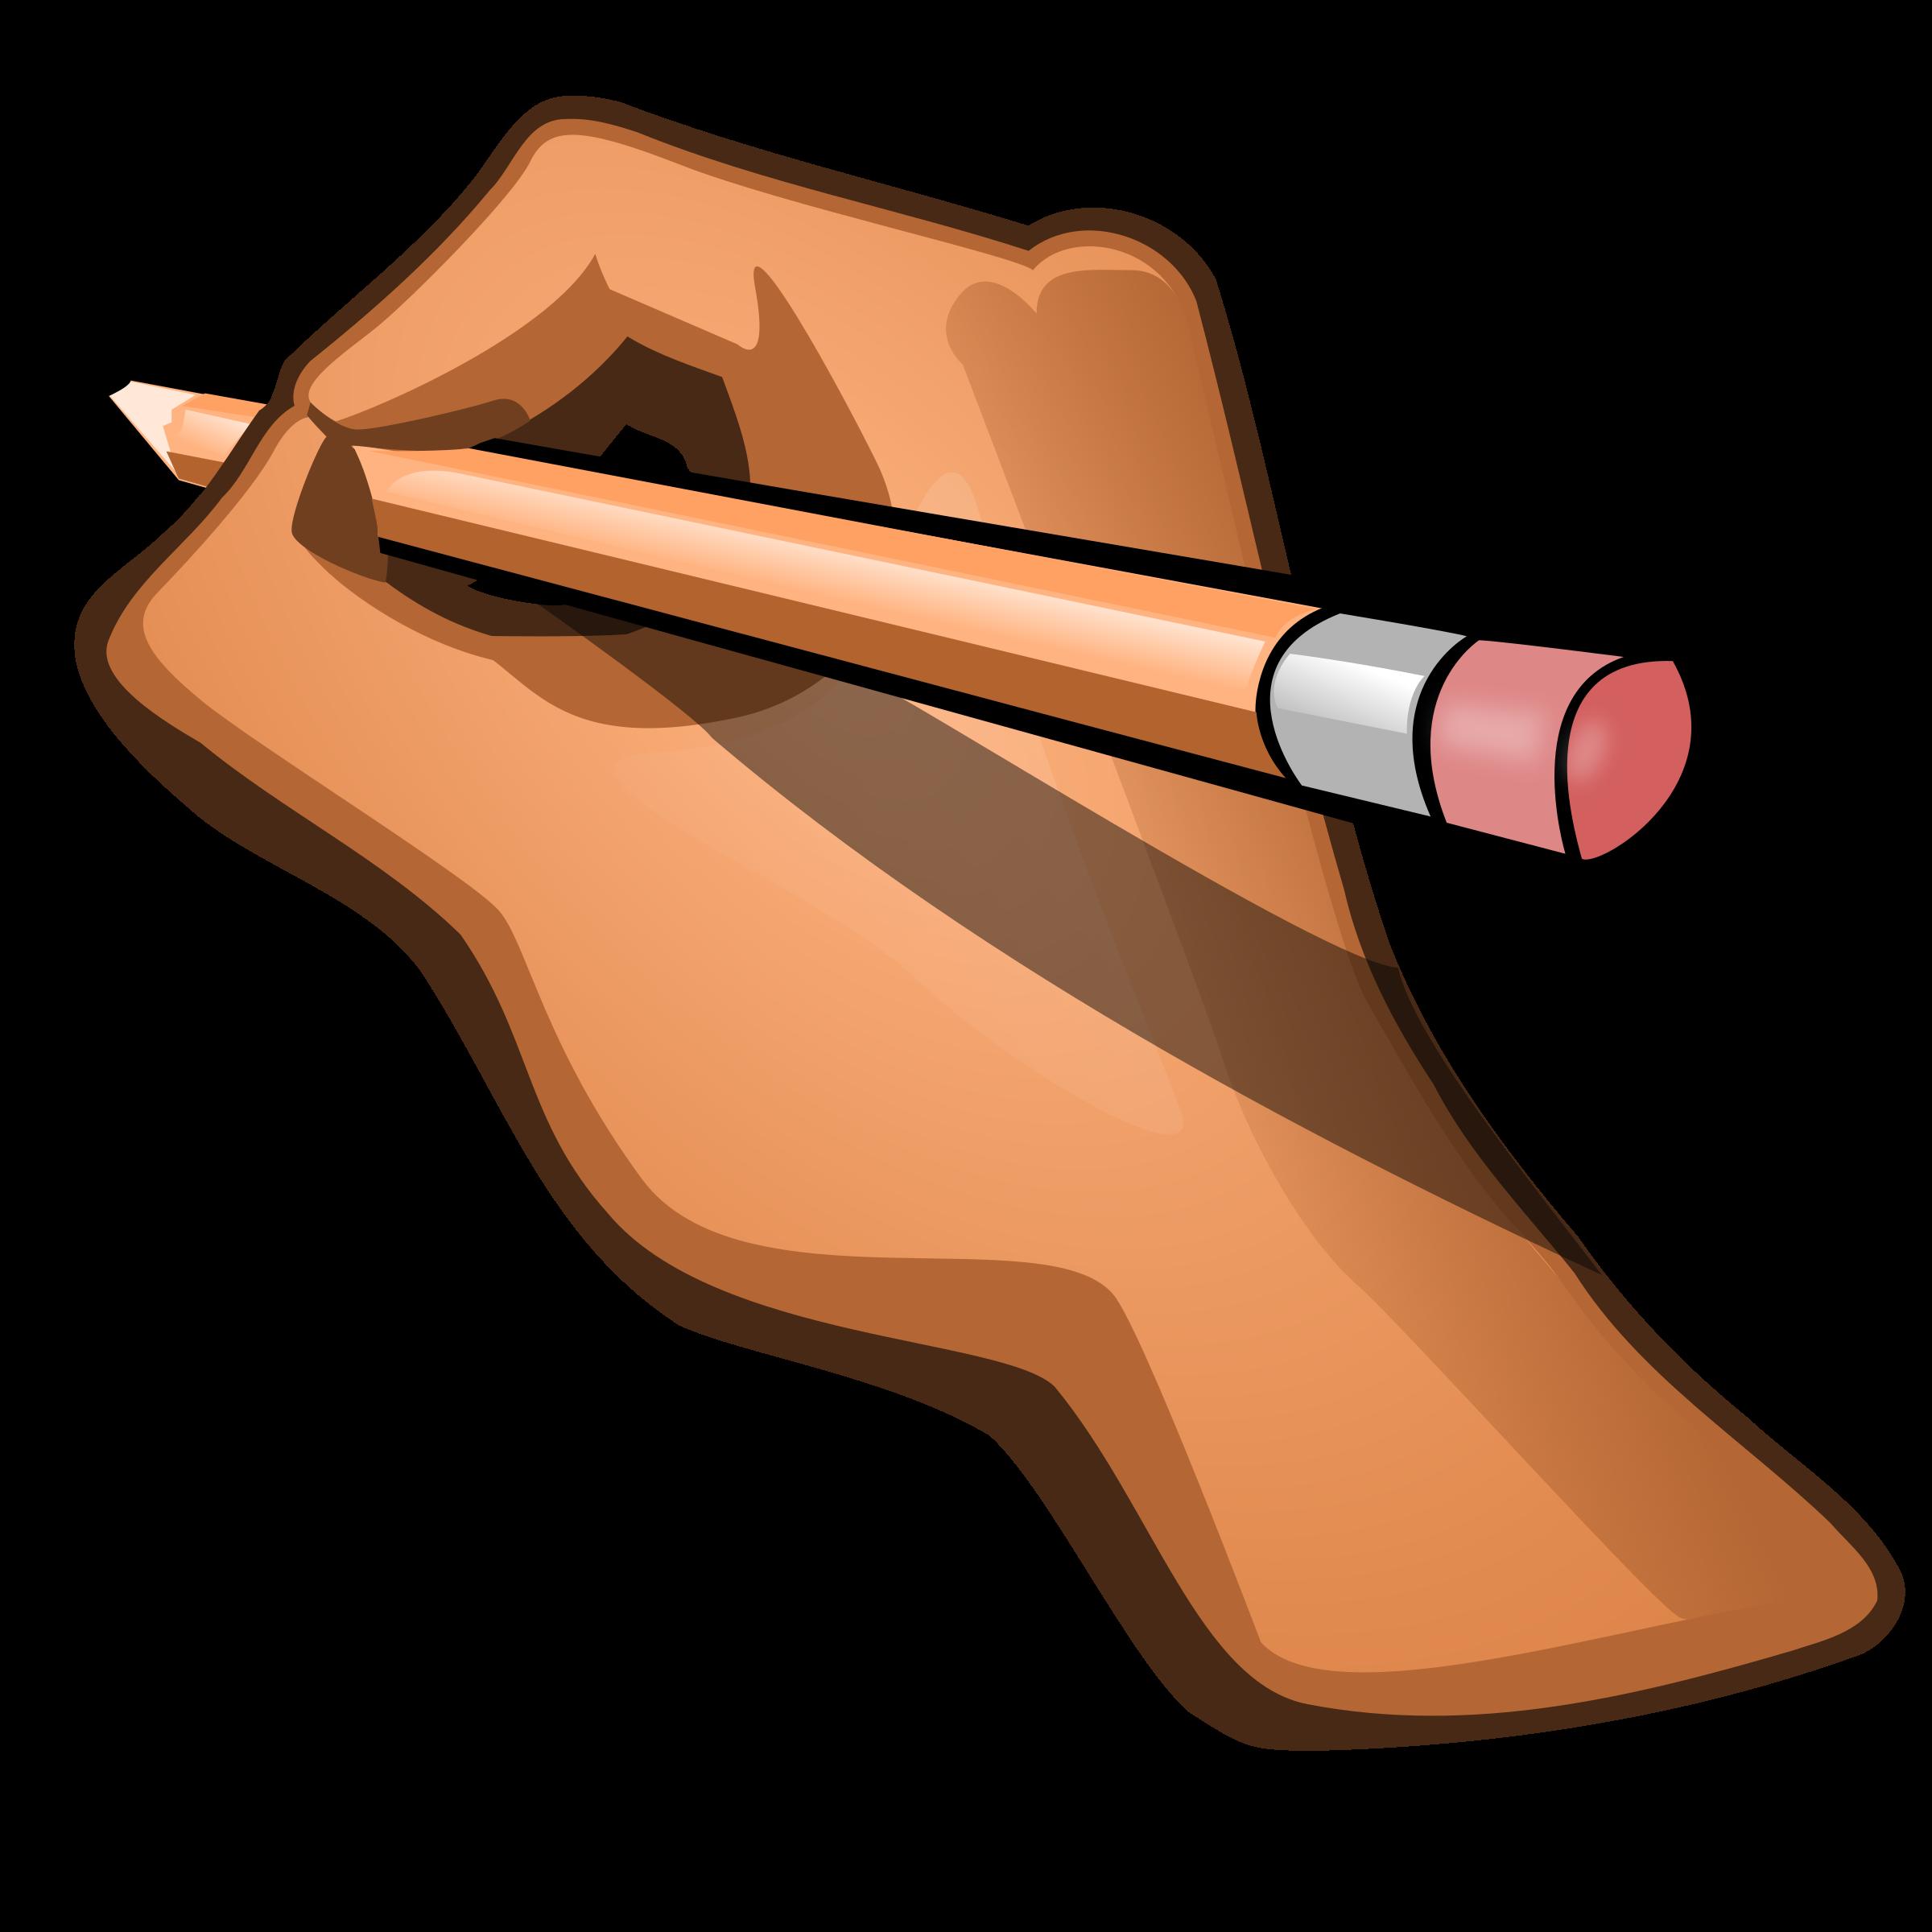 Journal clipart pen. Edit hand holding pencil